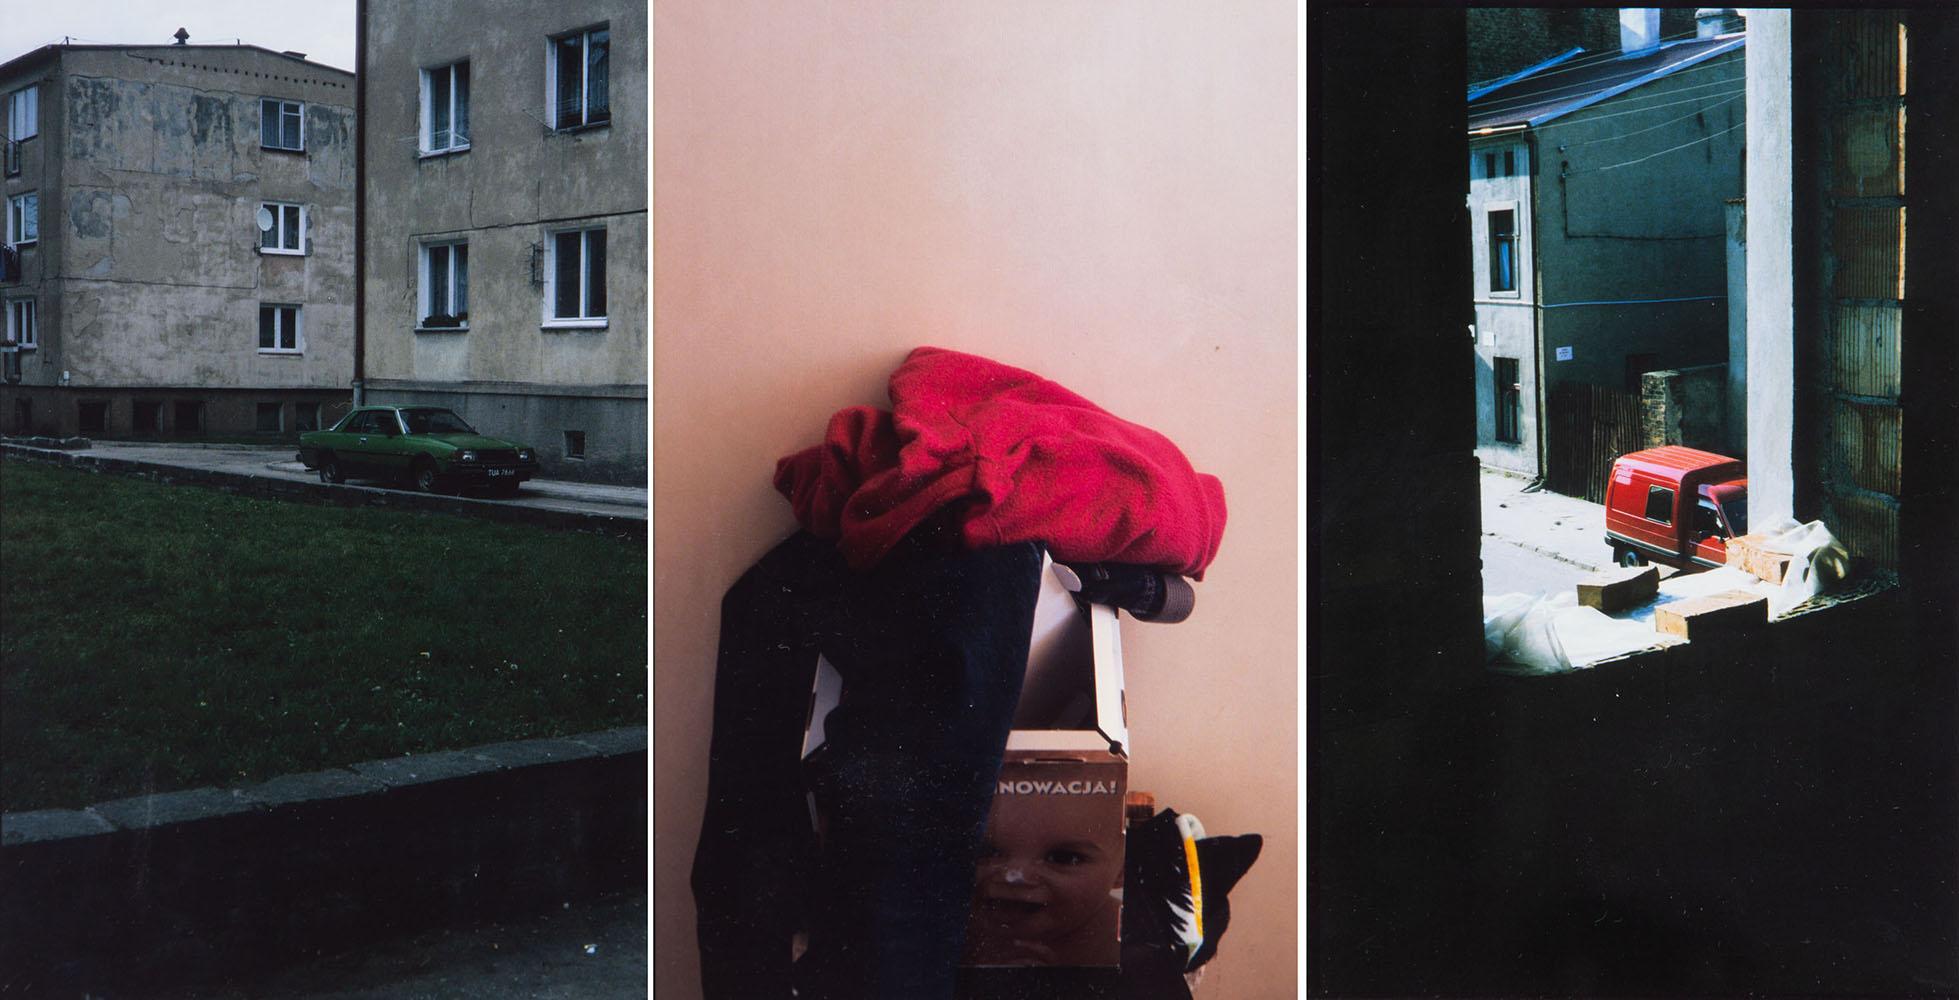 Z cyklu 'Random Pleasures', Bez tytułu, 2002/2005